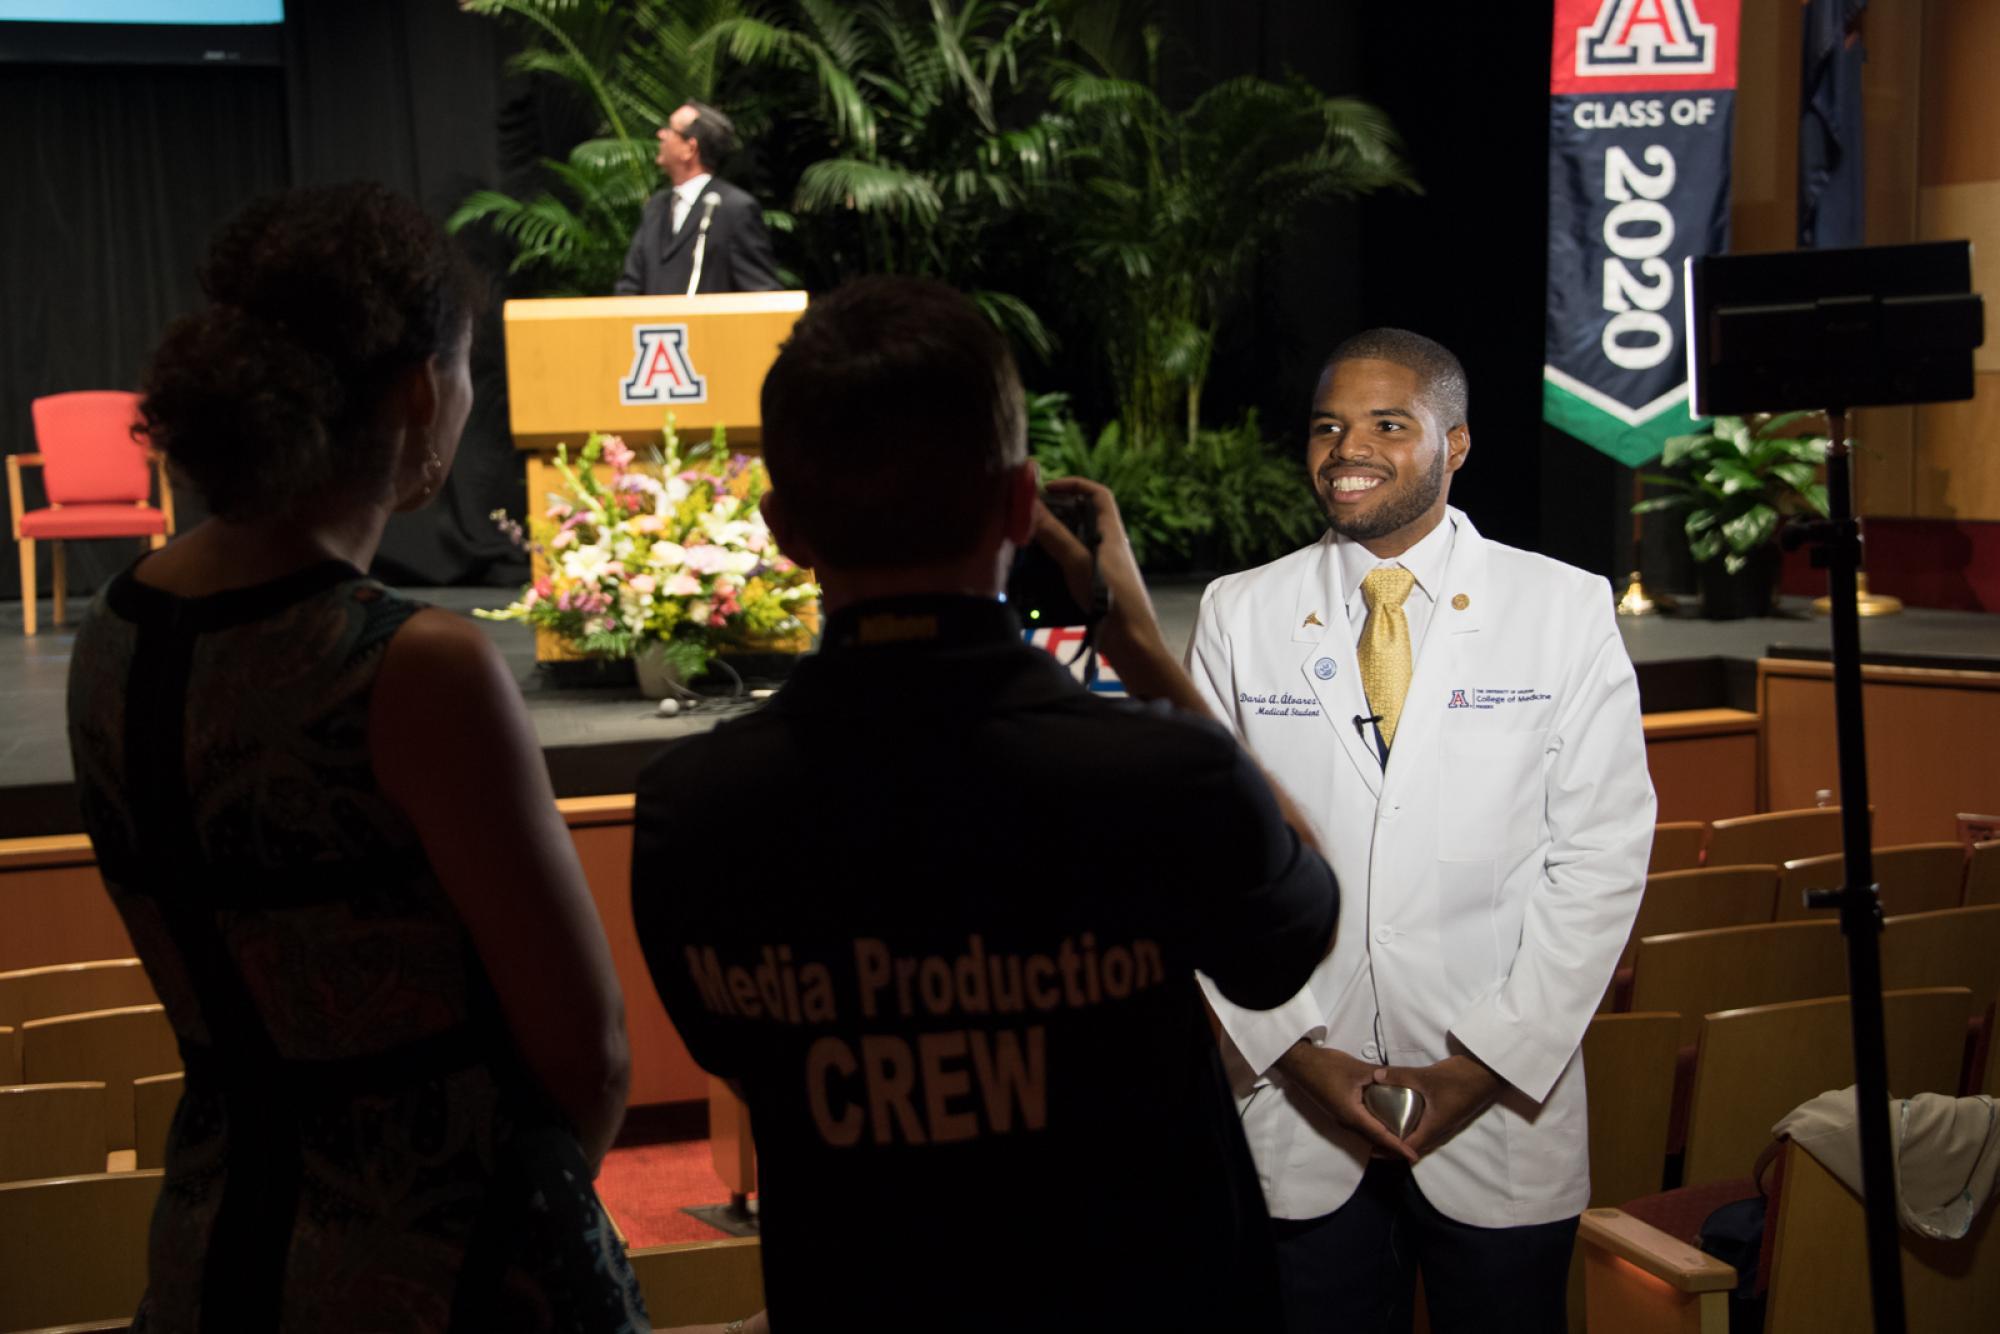 Dario Alvarez, who graduated from the Pathway Scholars Program, is interviewed before the ceremony.